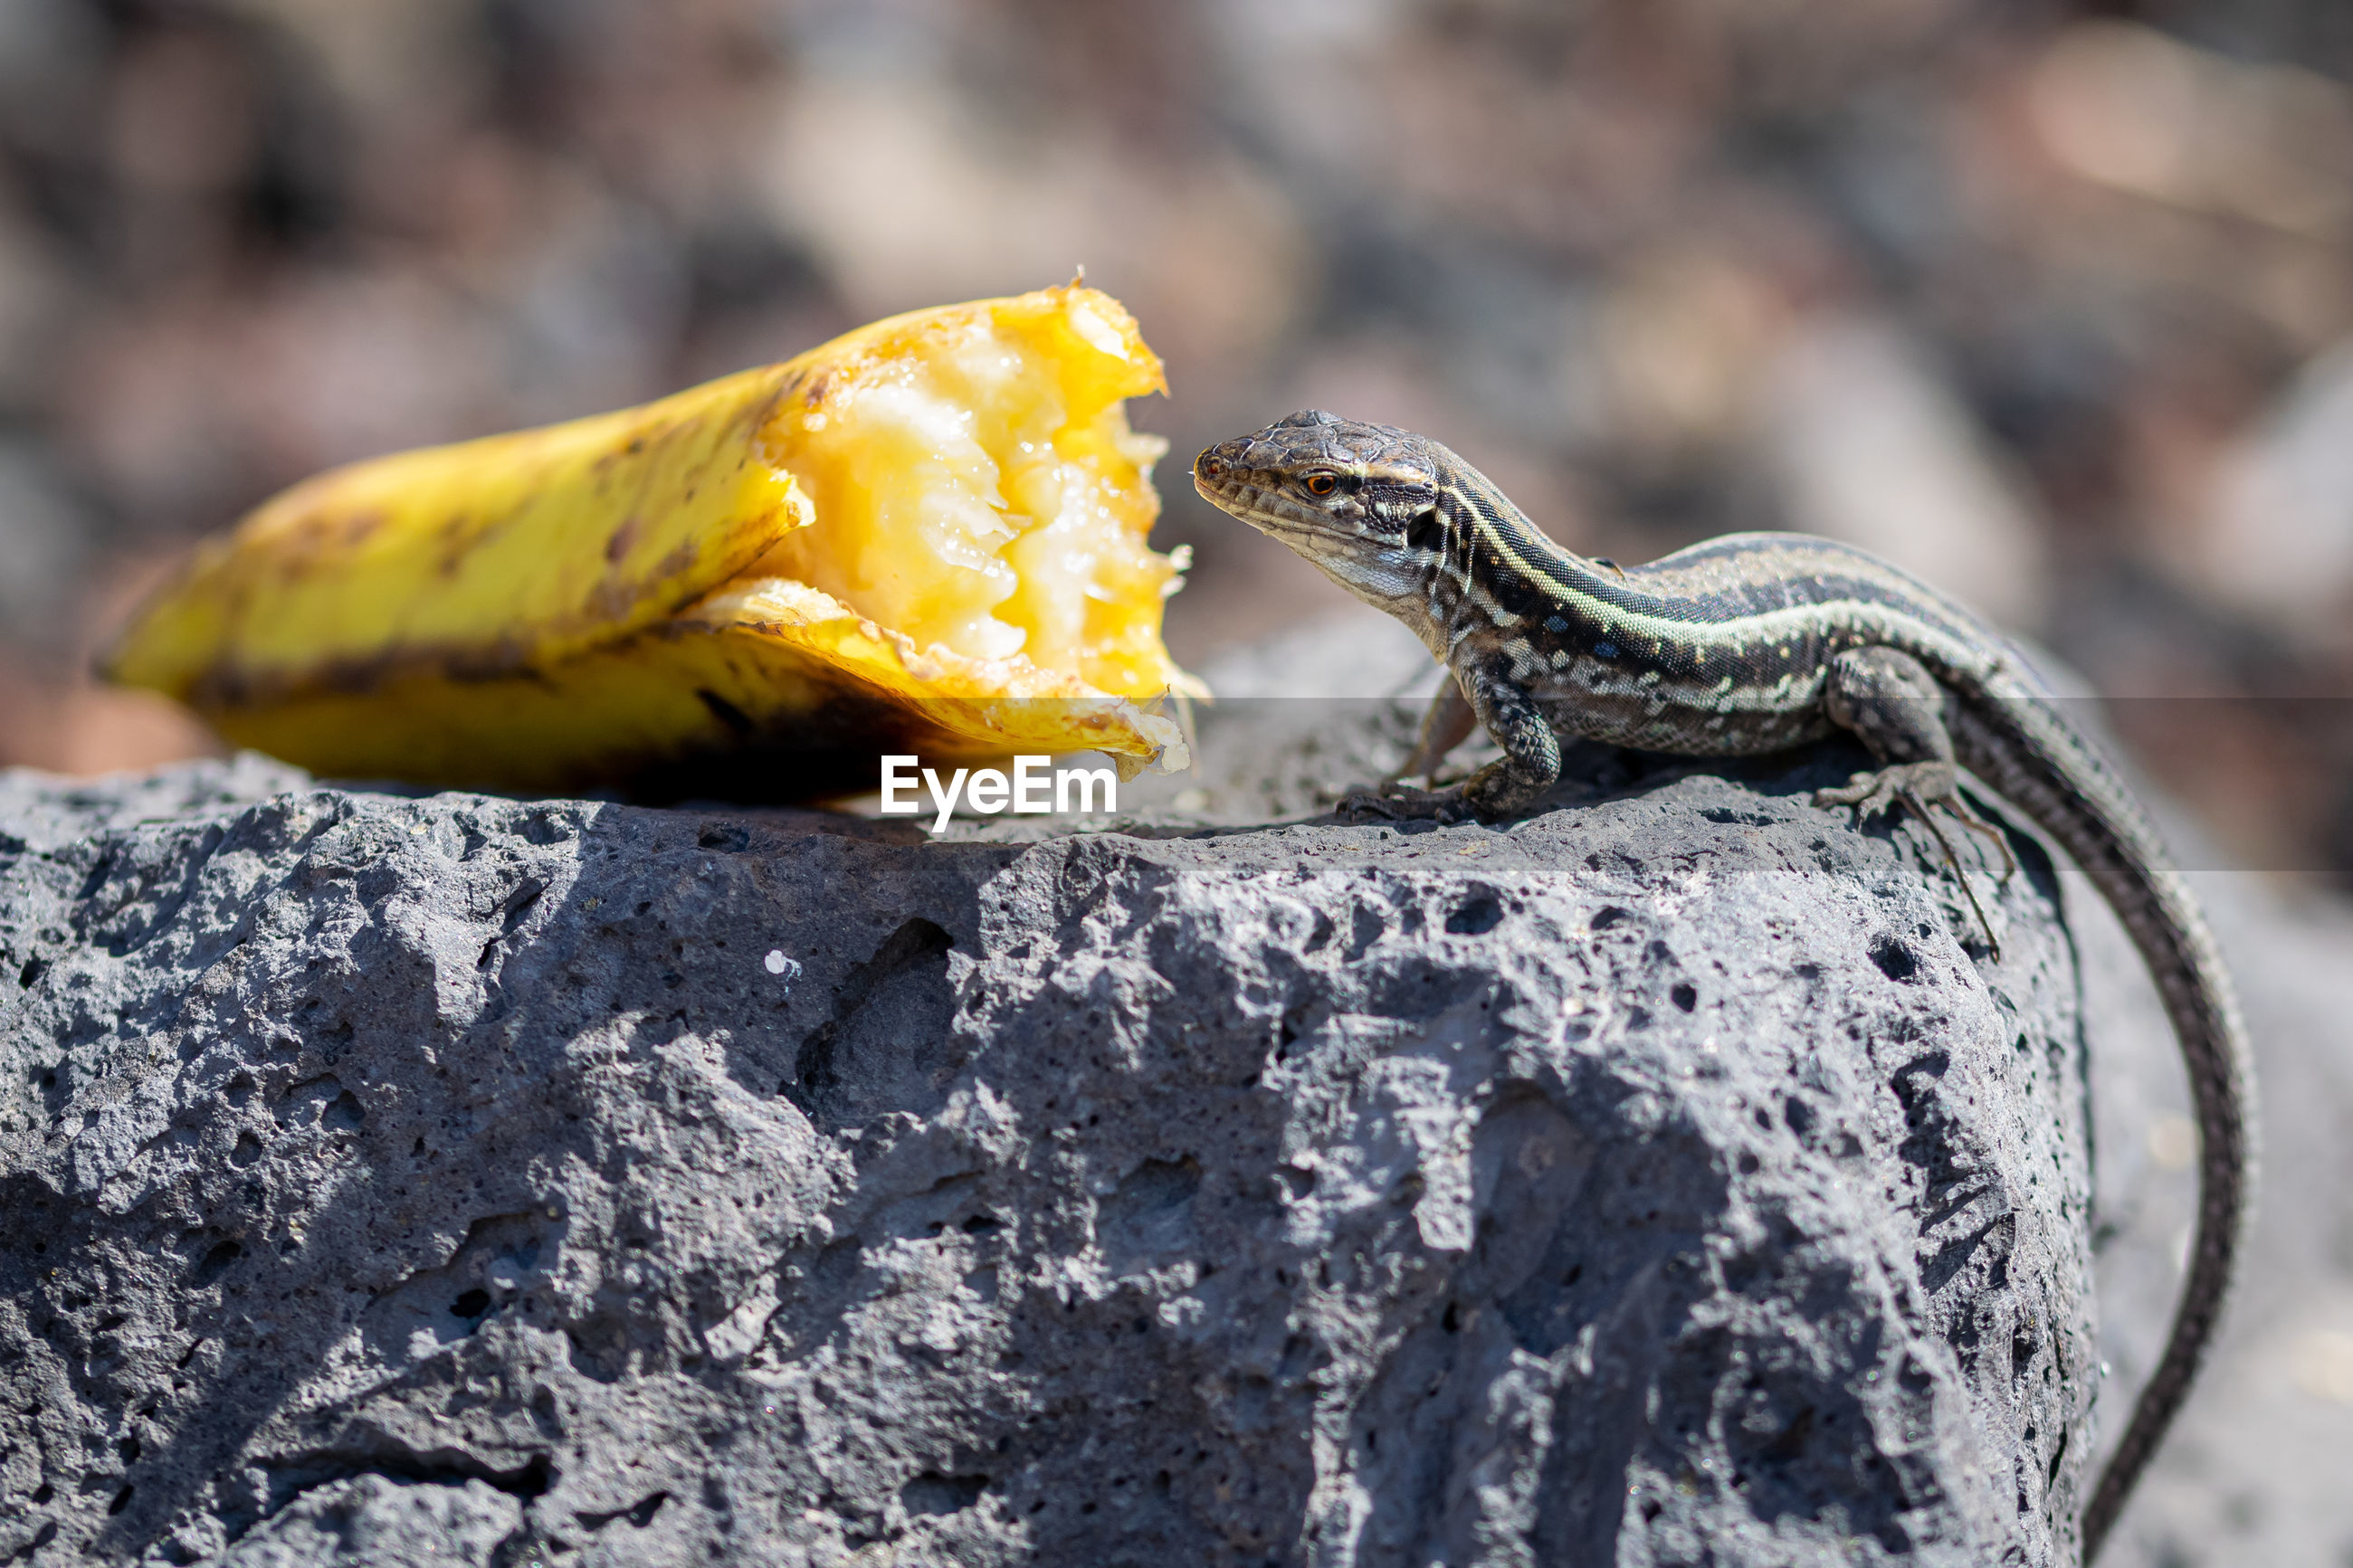 Gallotia galloti palmae eating banana on volcanic rock, male lizard has blue color under neck